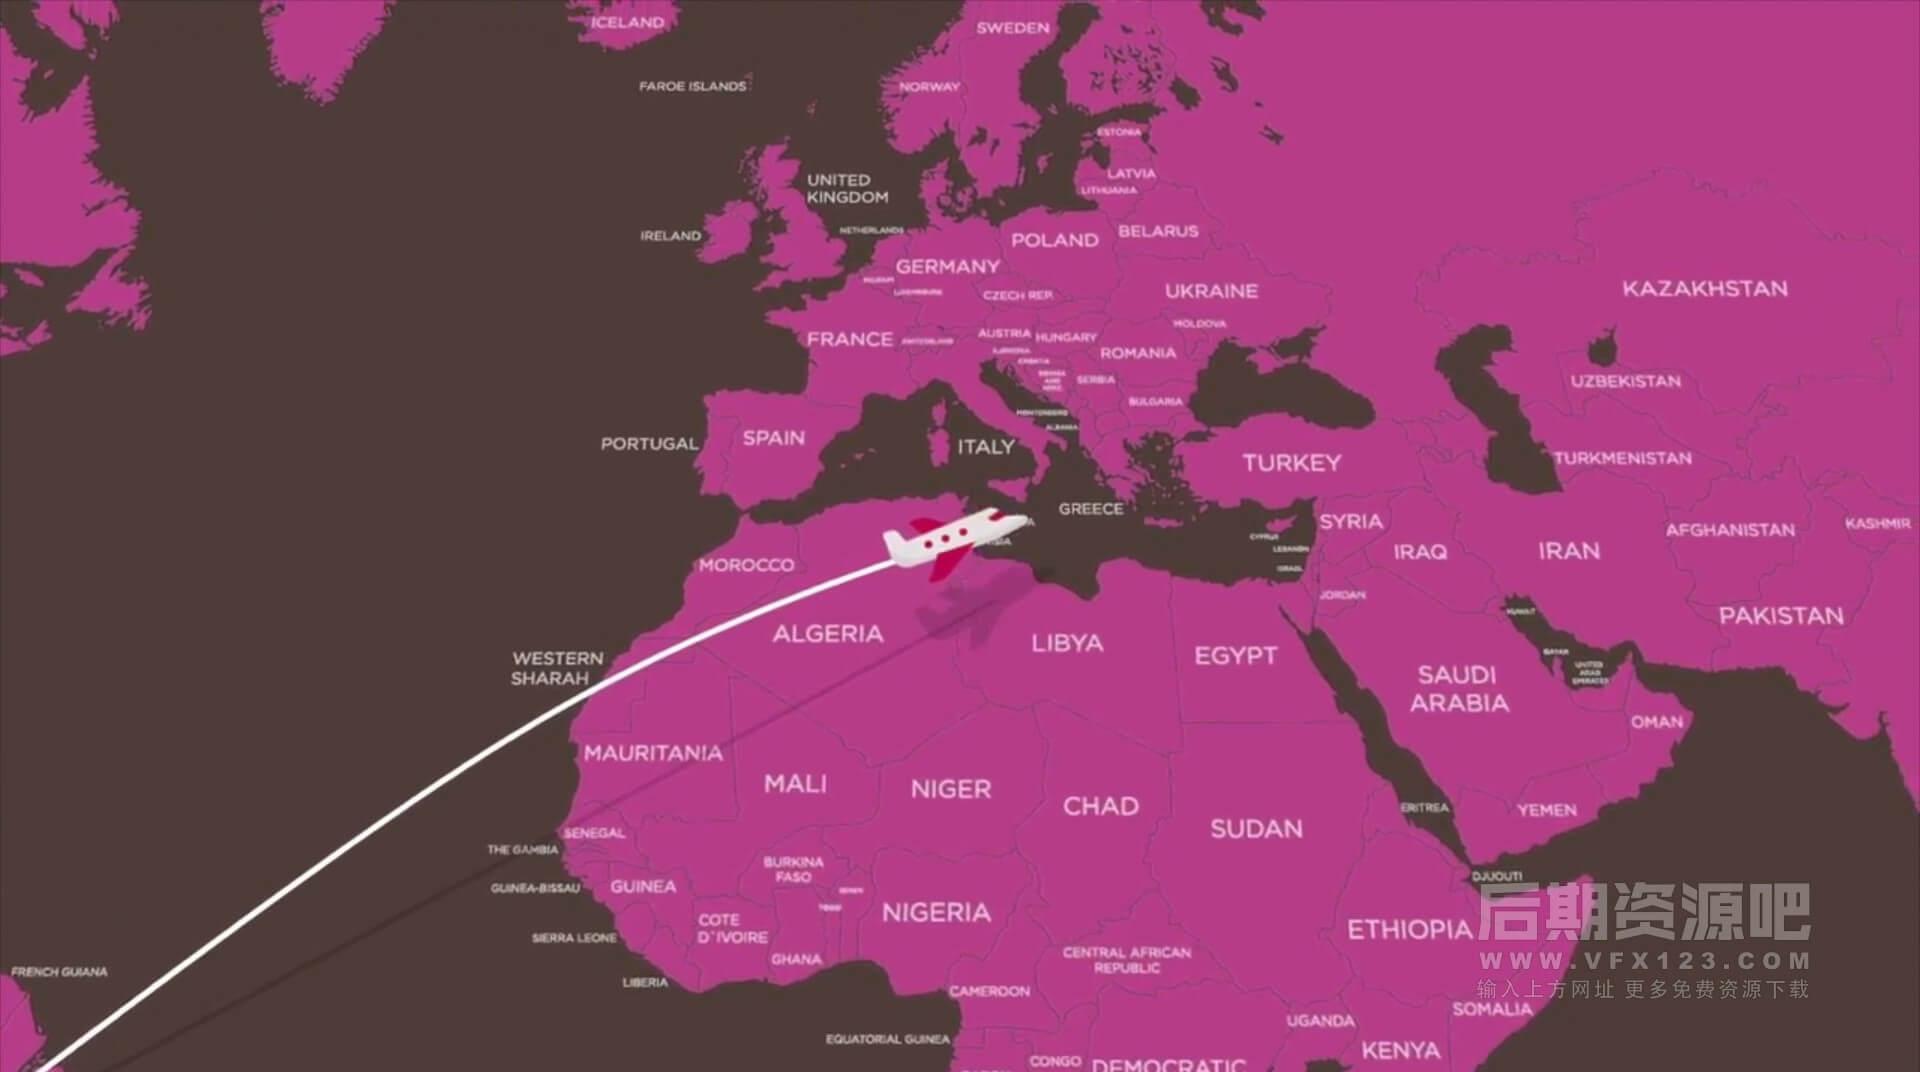 fcpx插件 点对点地图动画路线生成器 旅行商务路线规划动画工具